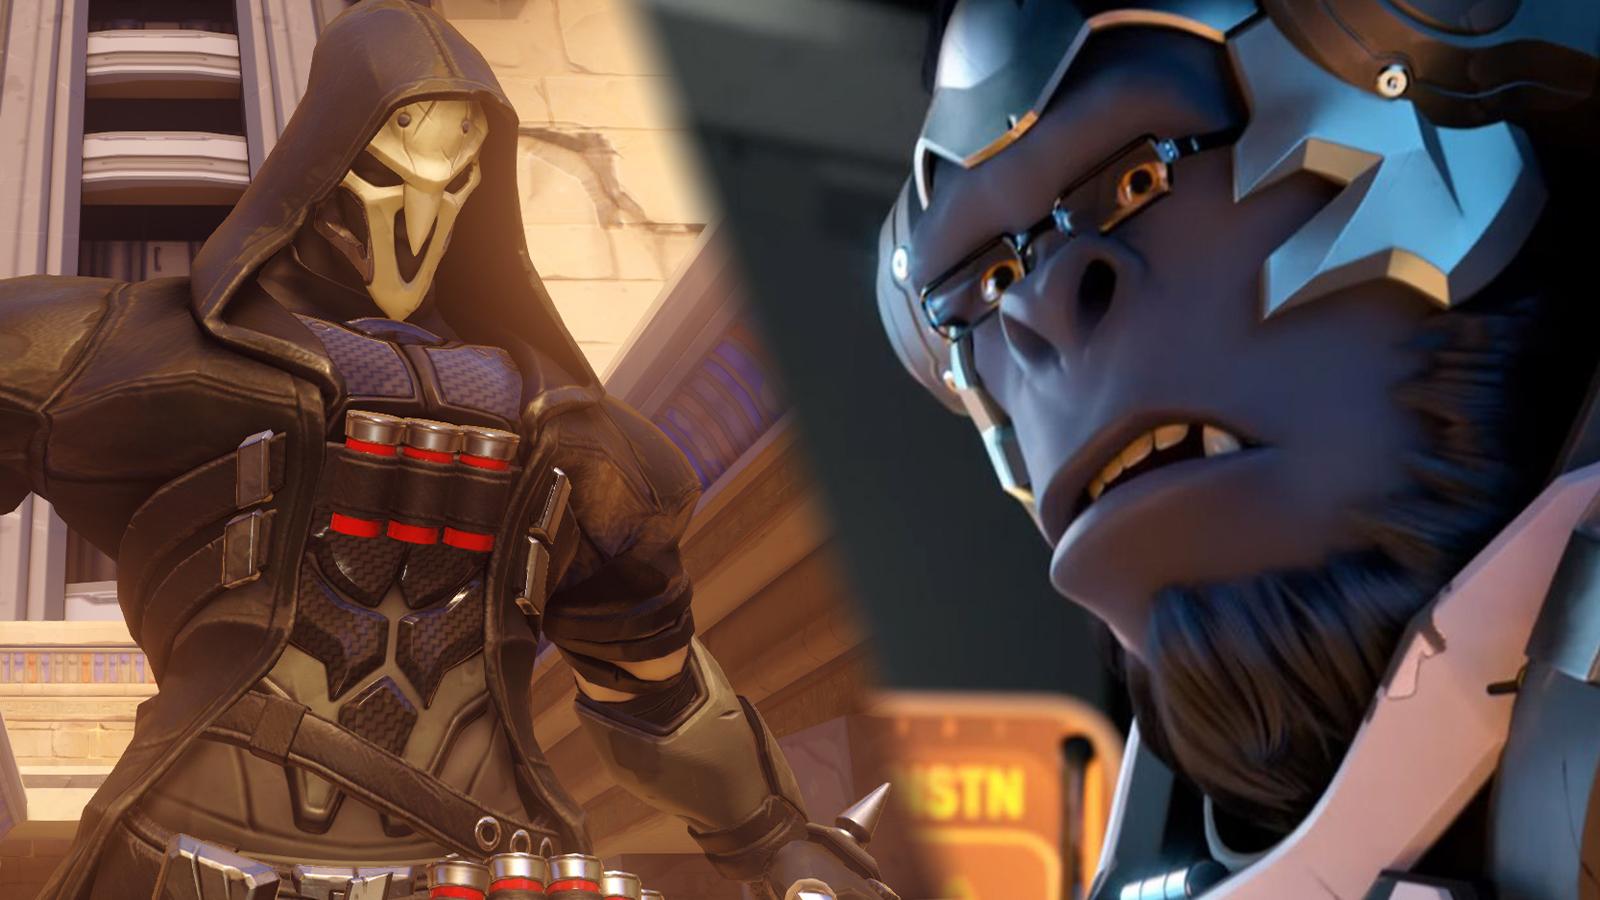 Overwatch Feb 11 update buffs Orisa & Winston, nerfs Reaper: patch notes - Dexerto